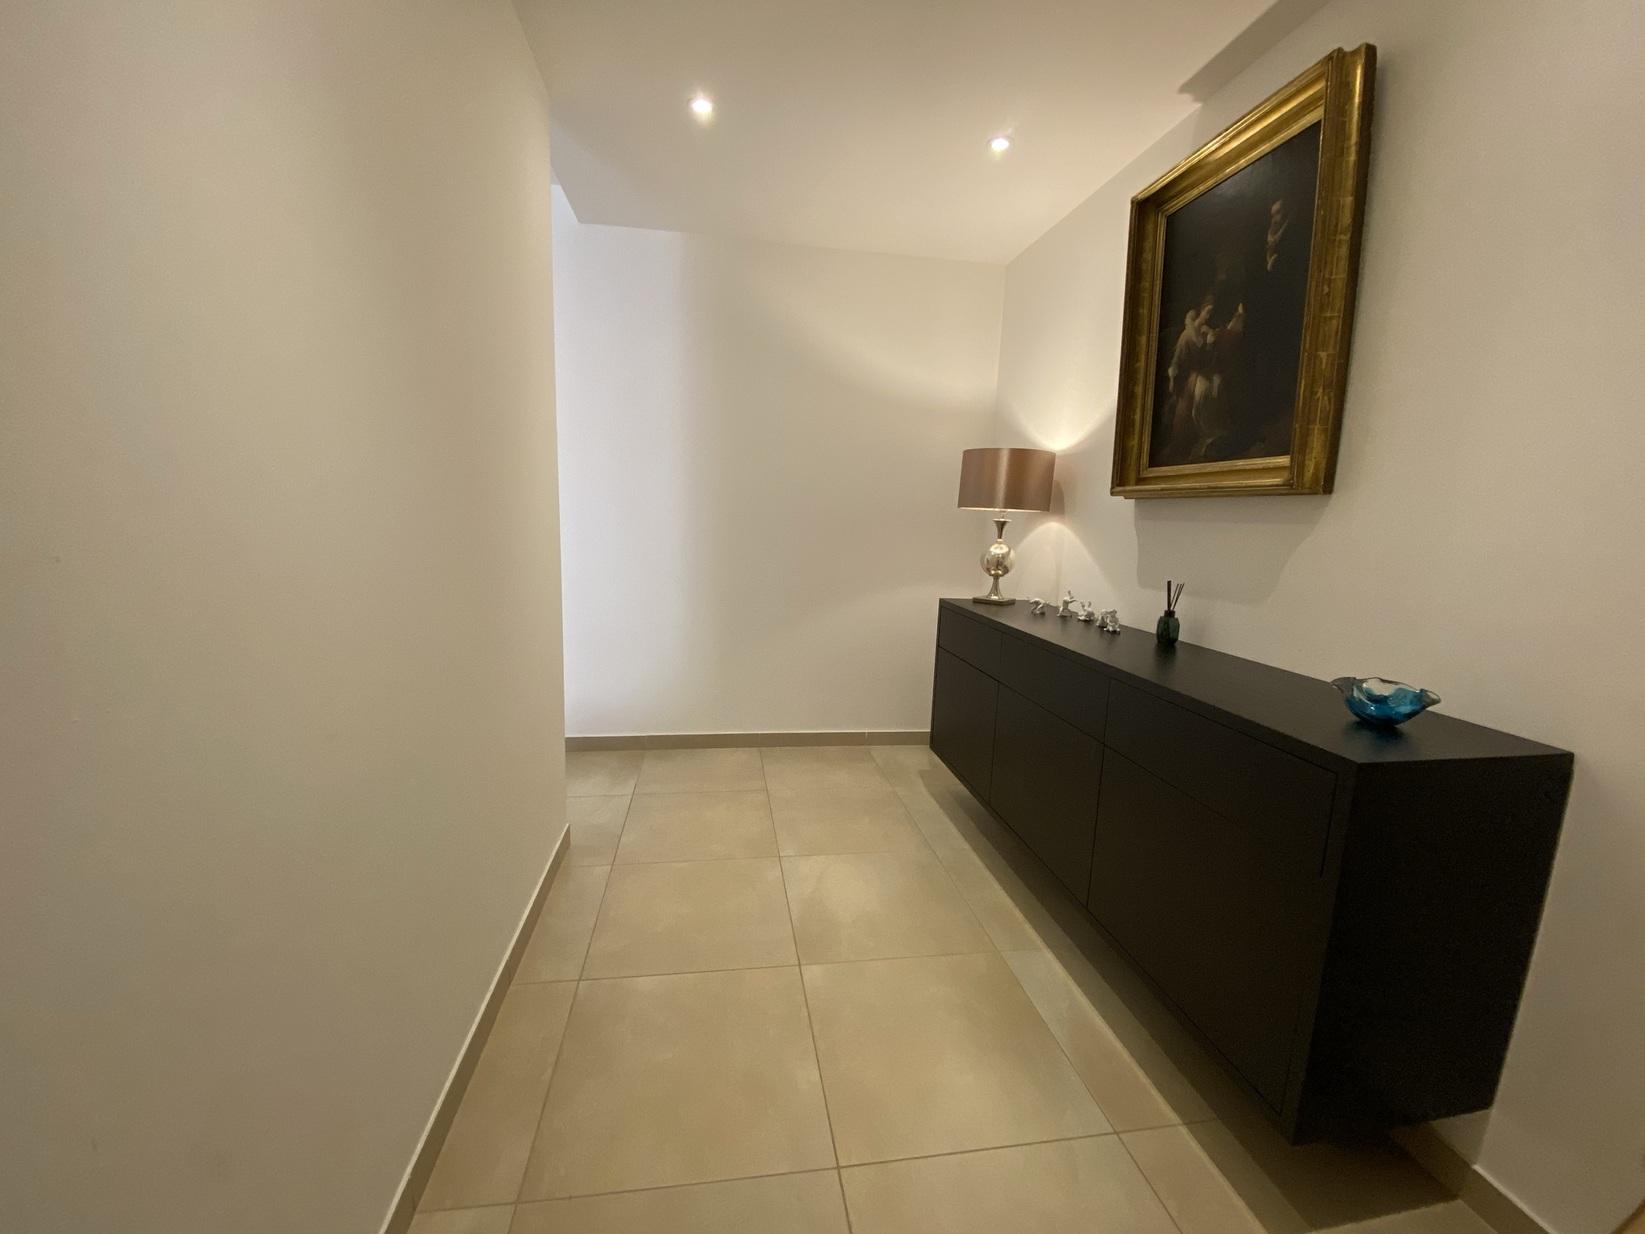 3 bed Terraced House For Sale in Balzan, Balzan - thumb 3